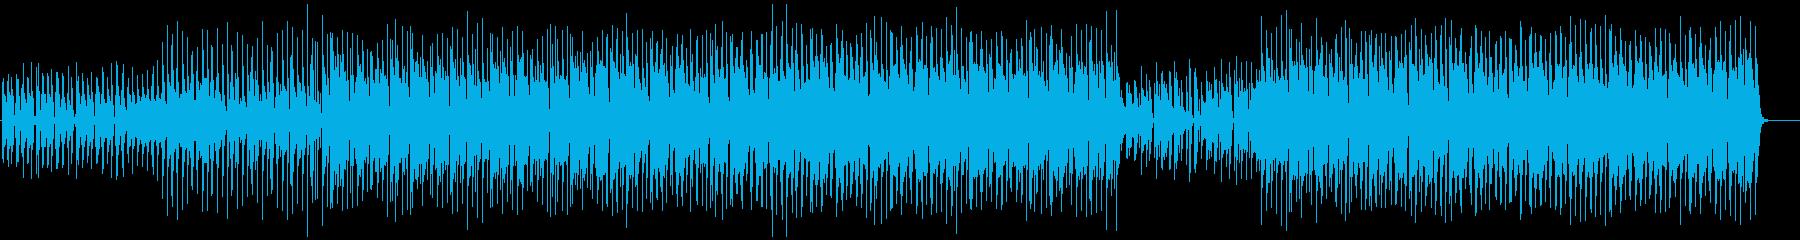 Energetic, fun, happy, ukulele, whistling's reproduced waveform